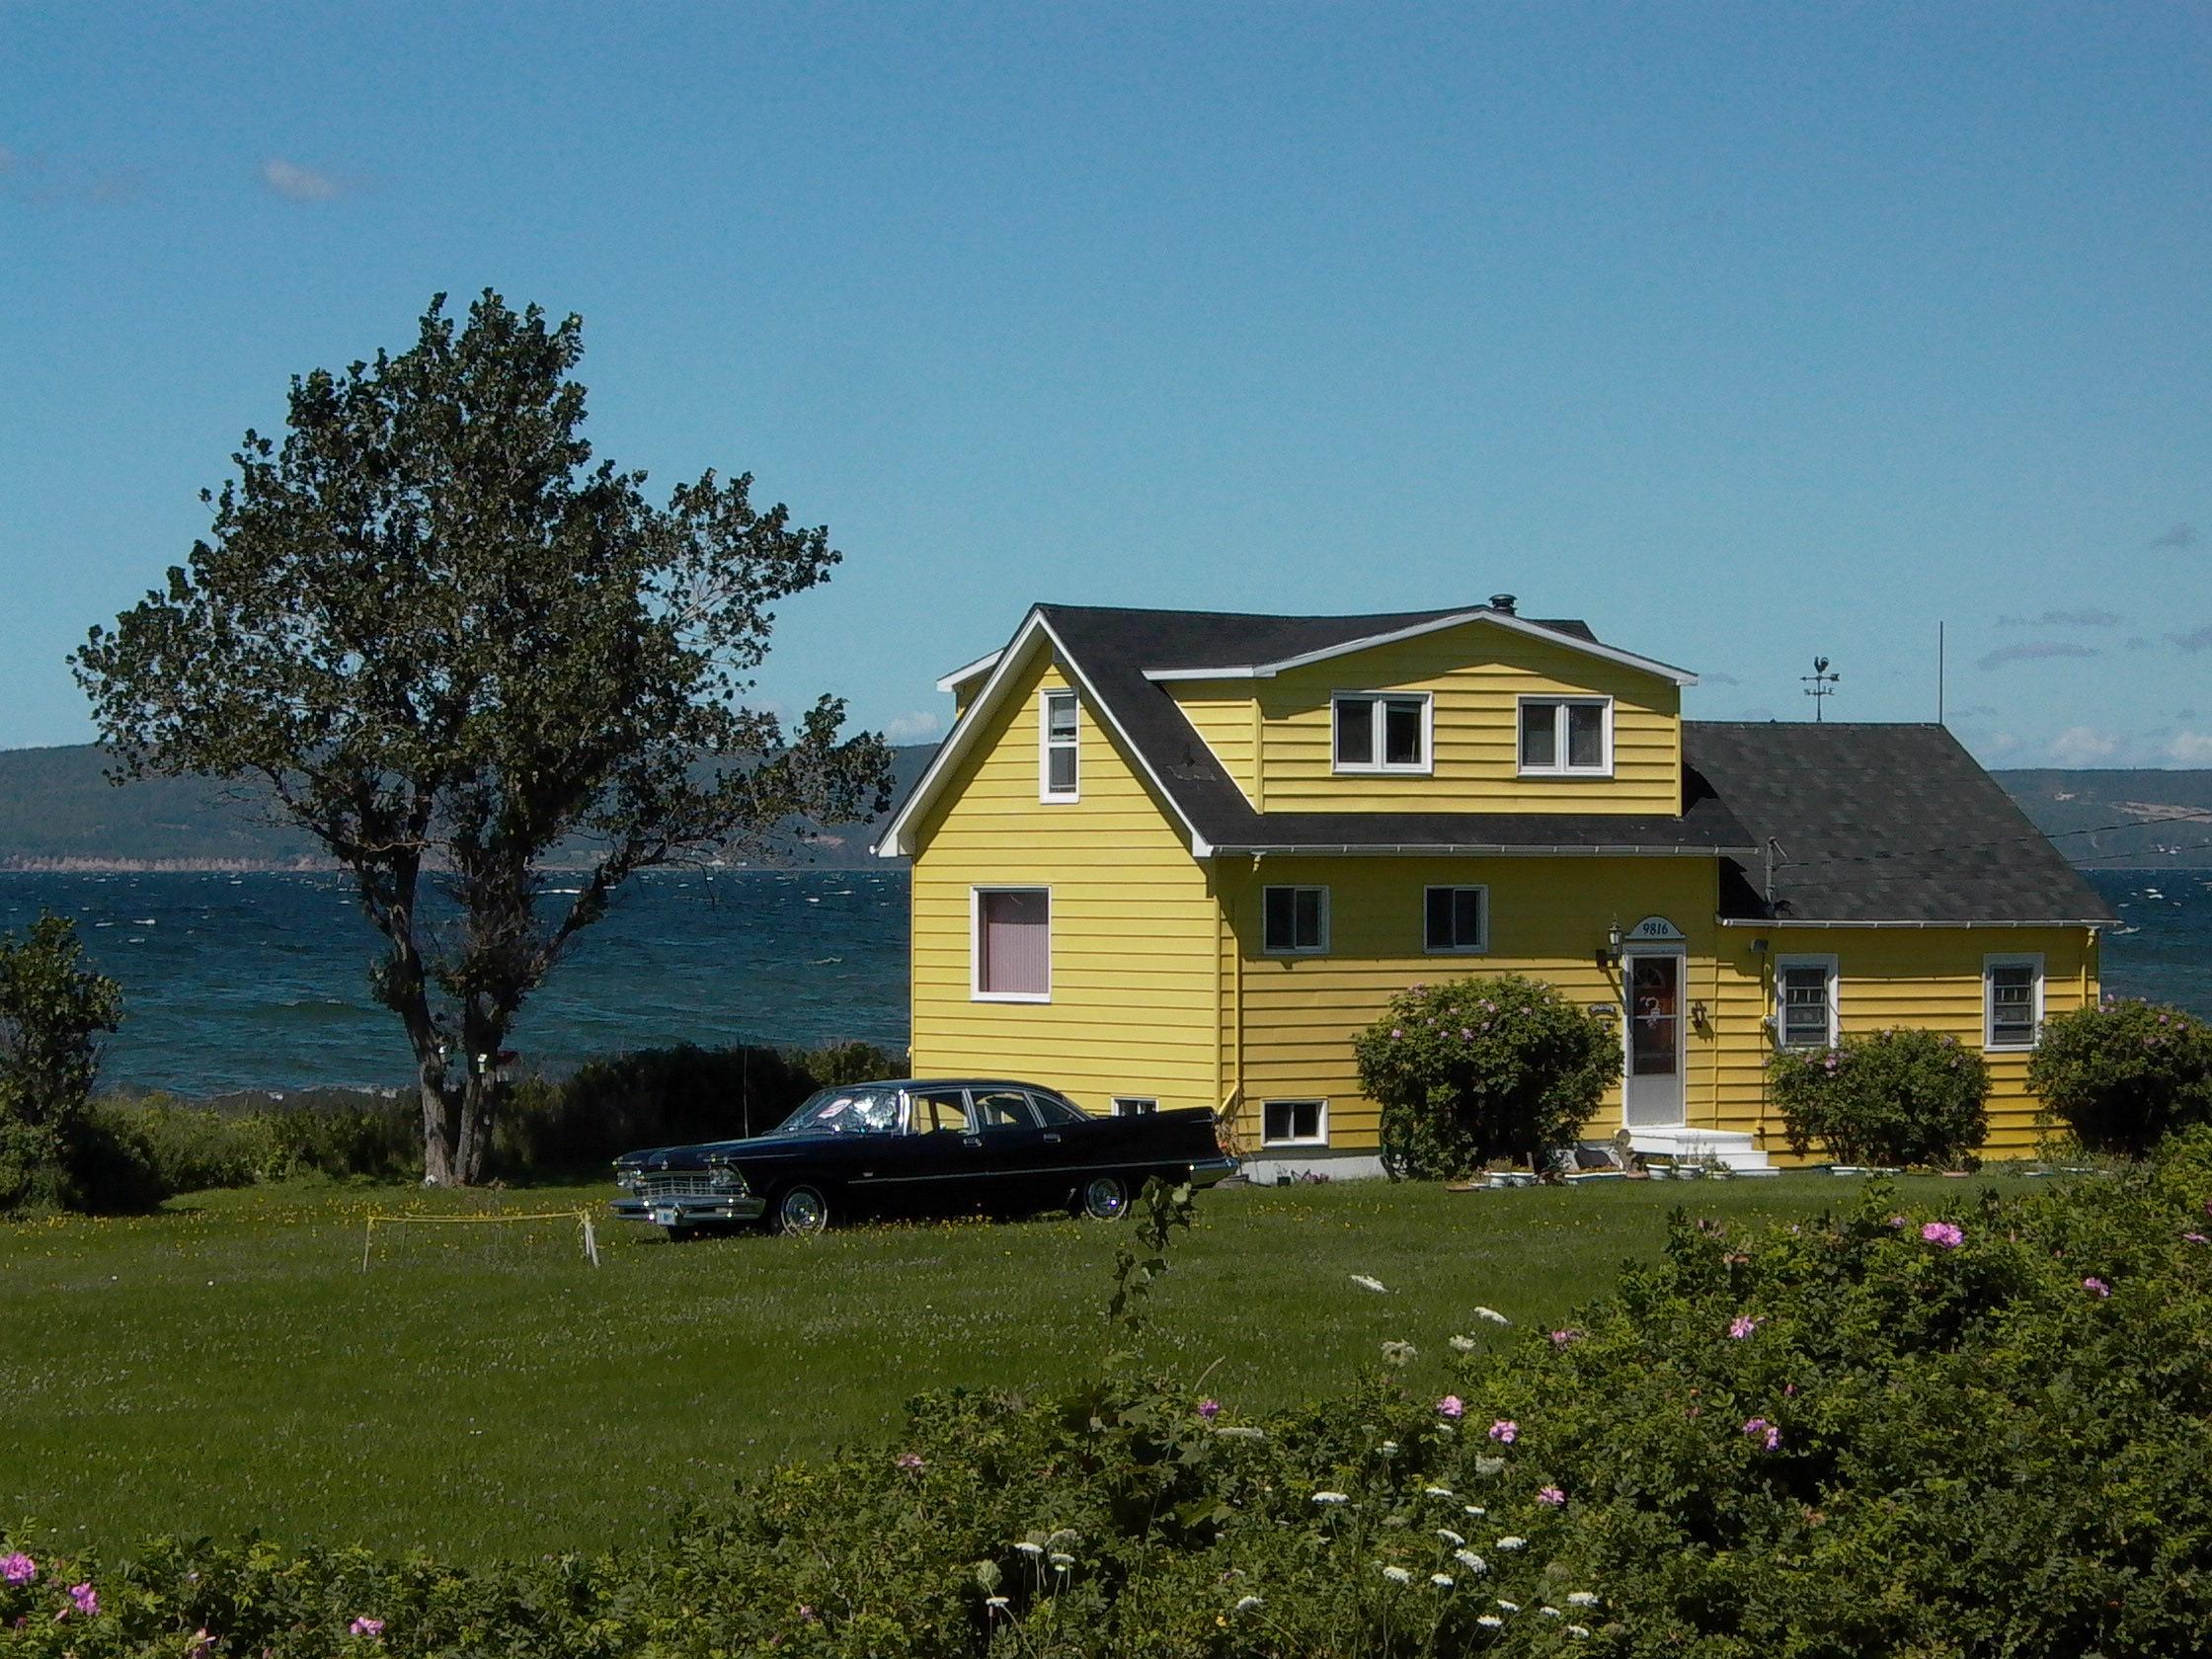 Free images farm villa house lake building suburb for Dream house builder online free